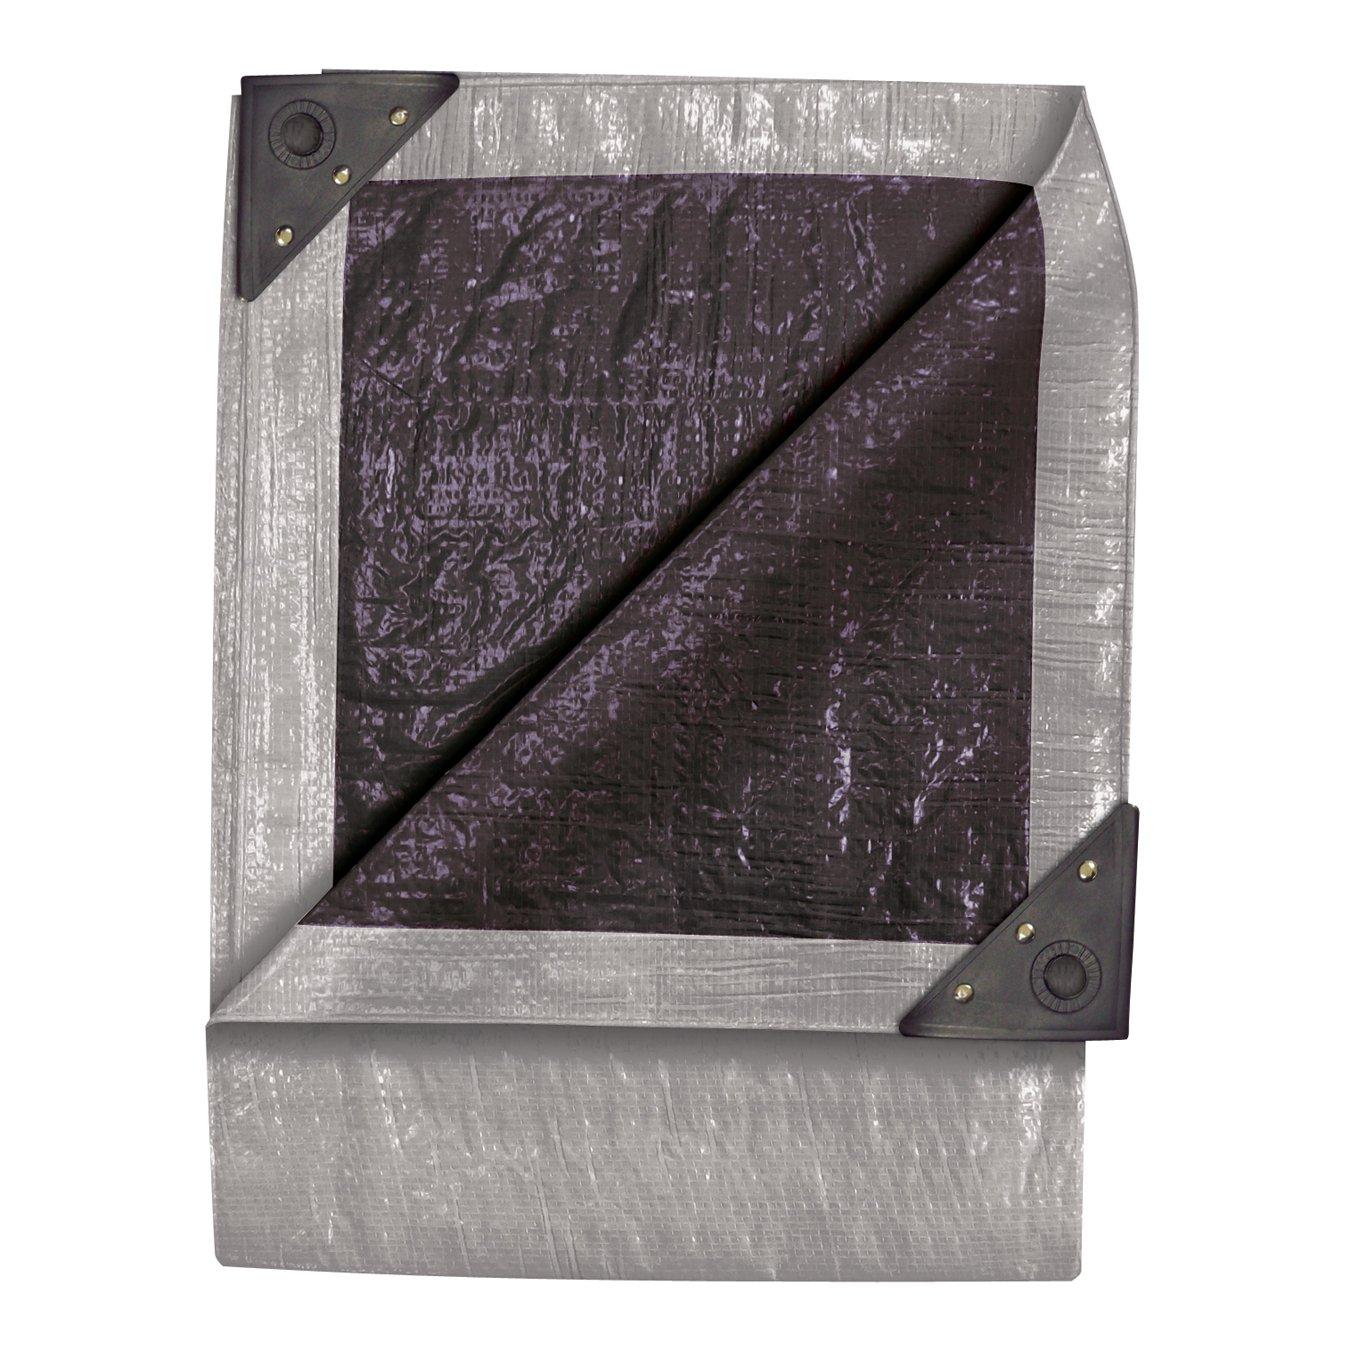 Silver//Black TEKTON 6338 12-Foot by 24-Foot Double Duty Tarp